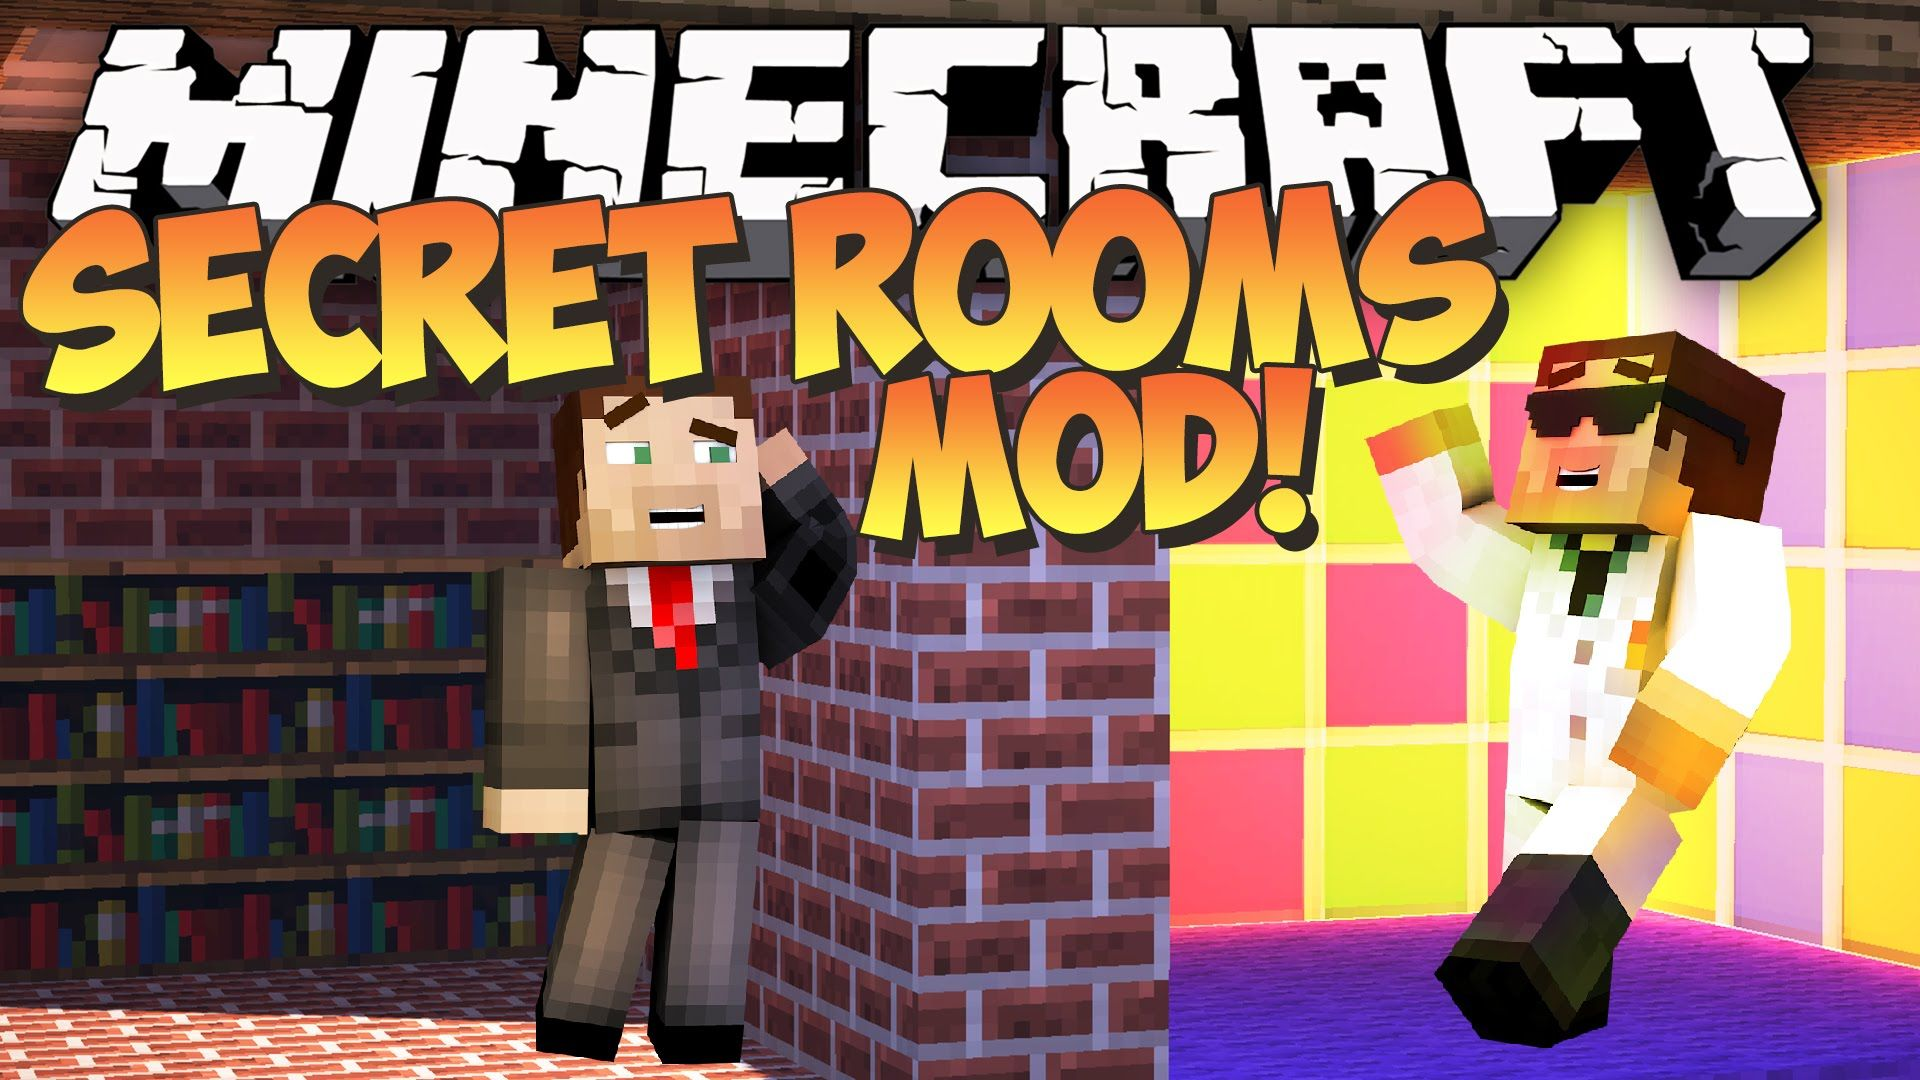 Secret Rooms Mod 1.12.2/1.7.10 Download Secret rooms